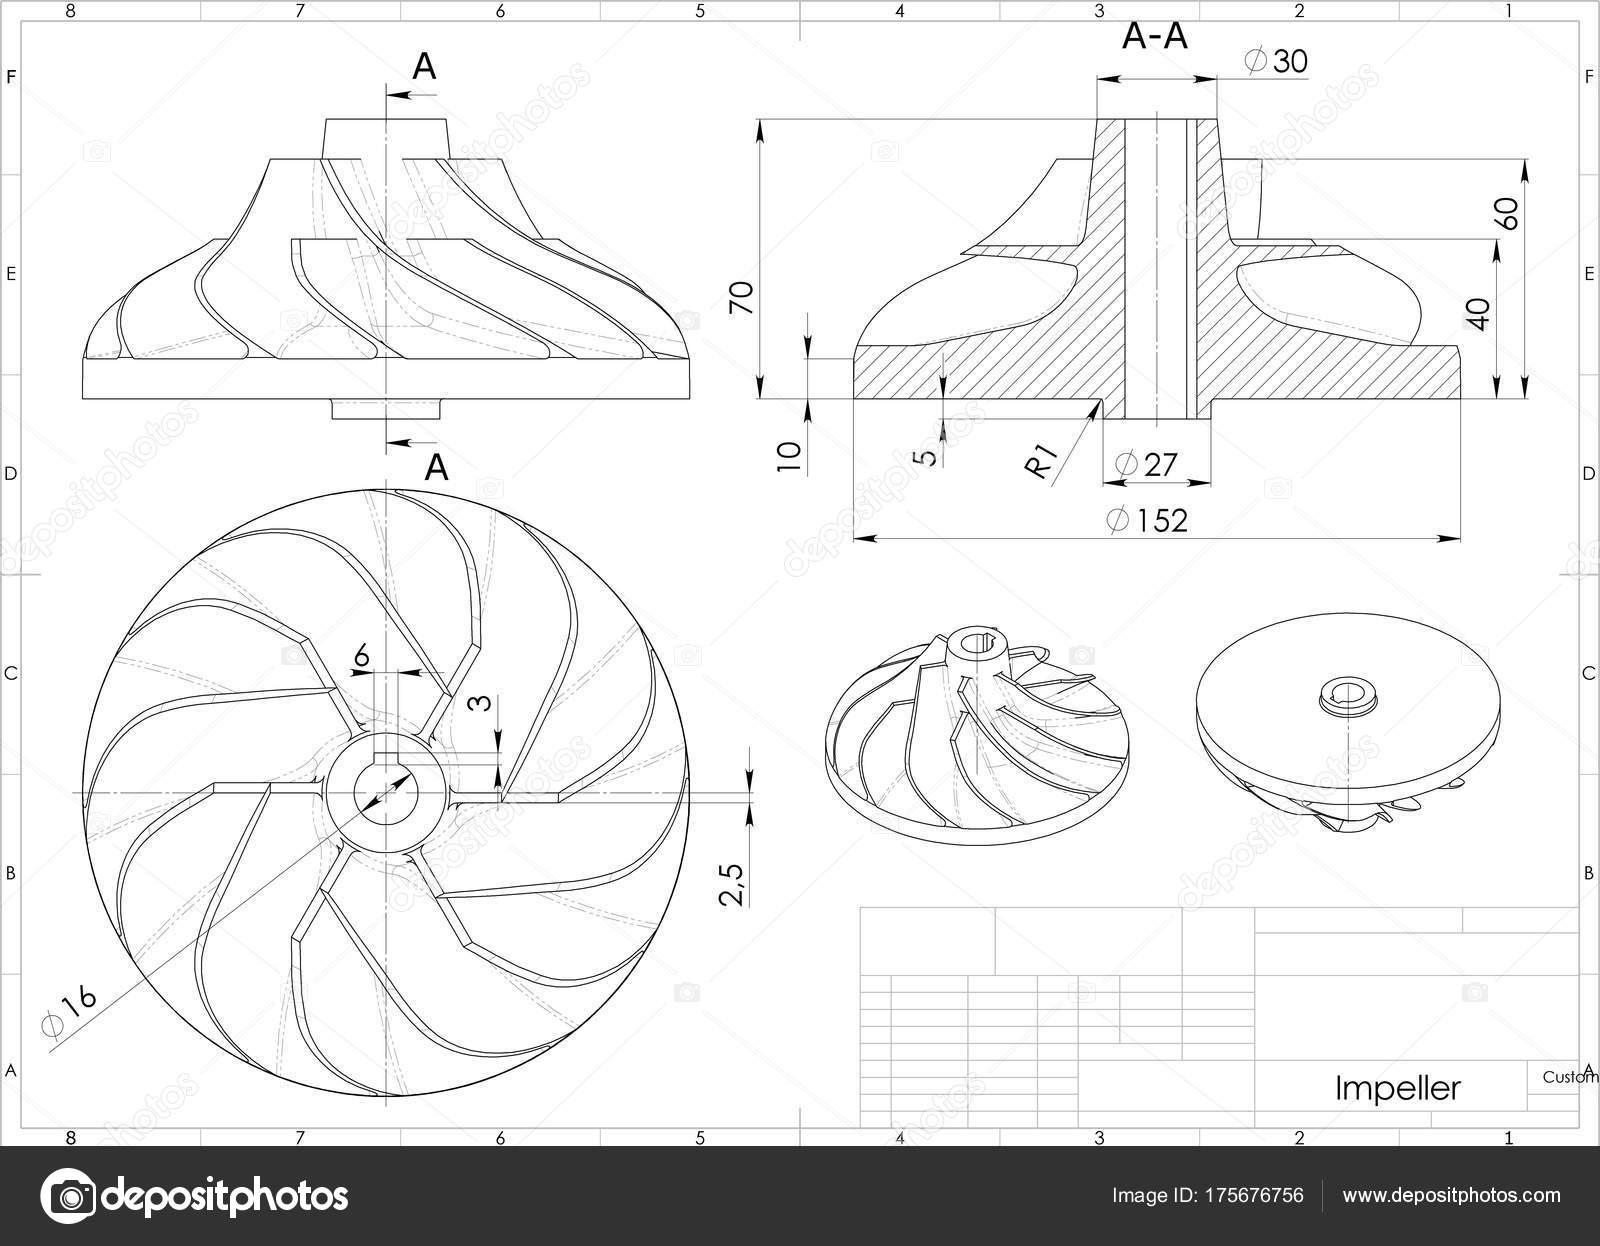 Illustration Turbo Impeller Engineering Drawing